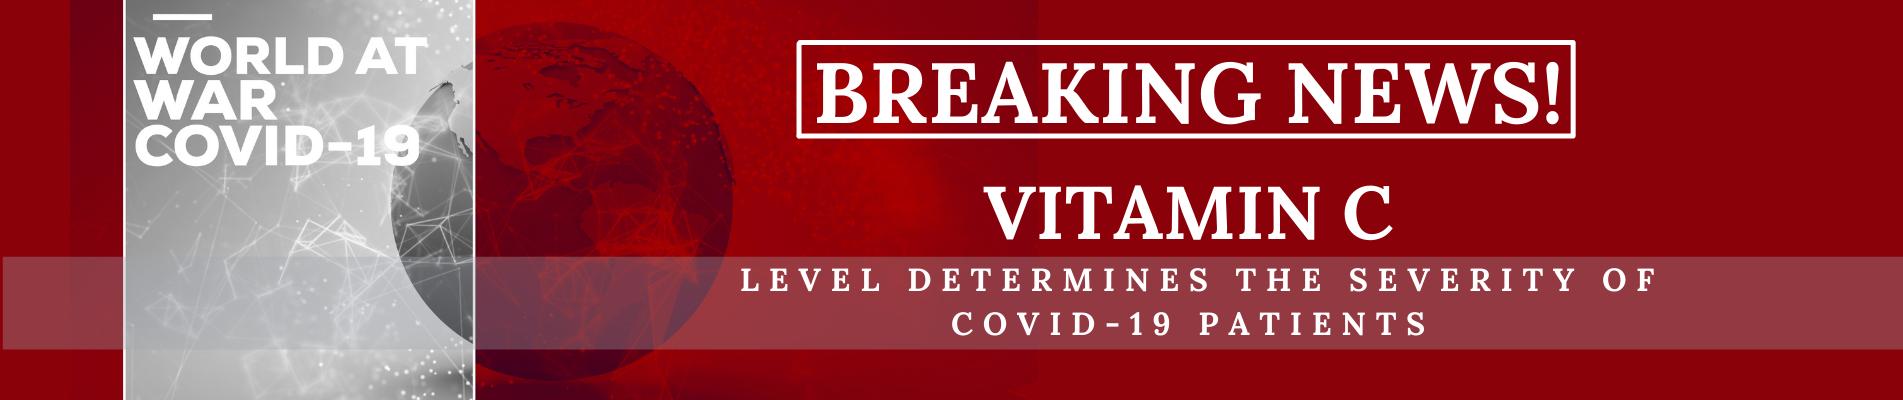 VITAMIN C LEVEL DETERMINES THE SEVERITY